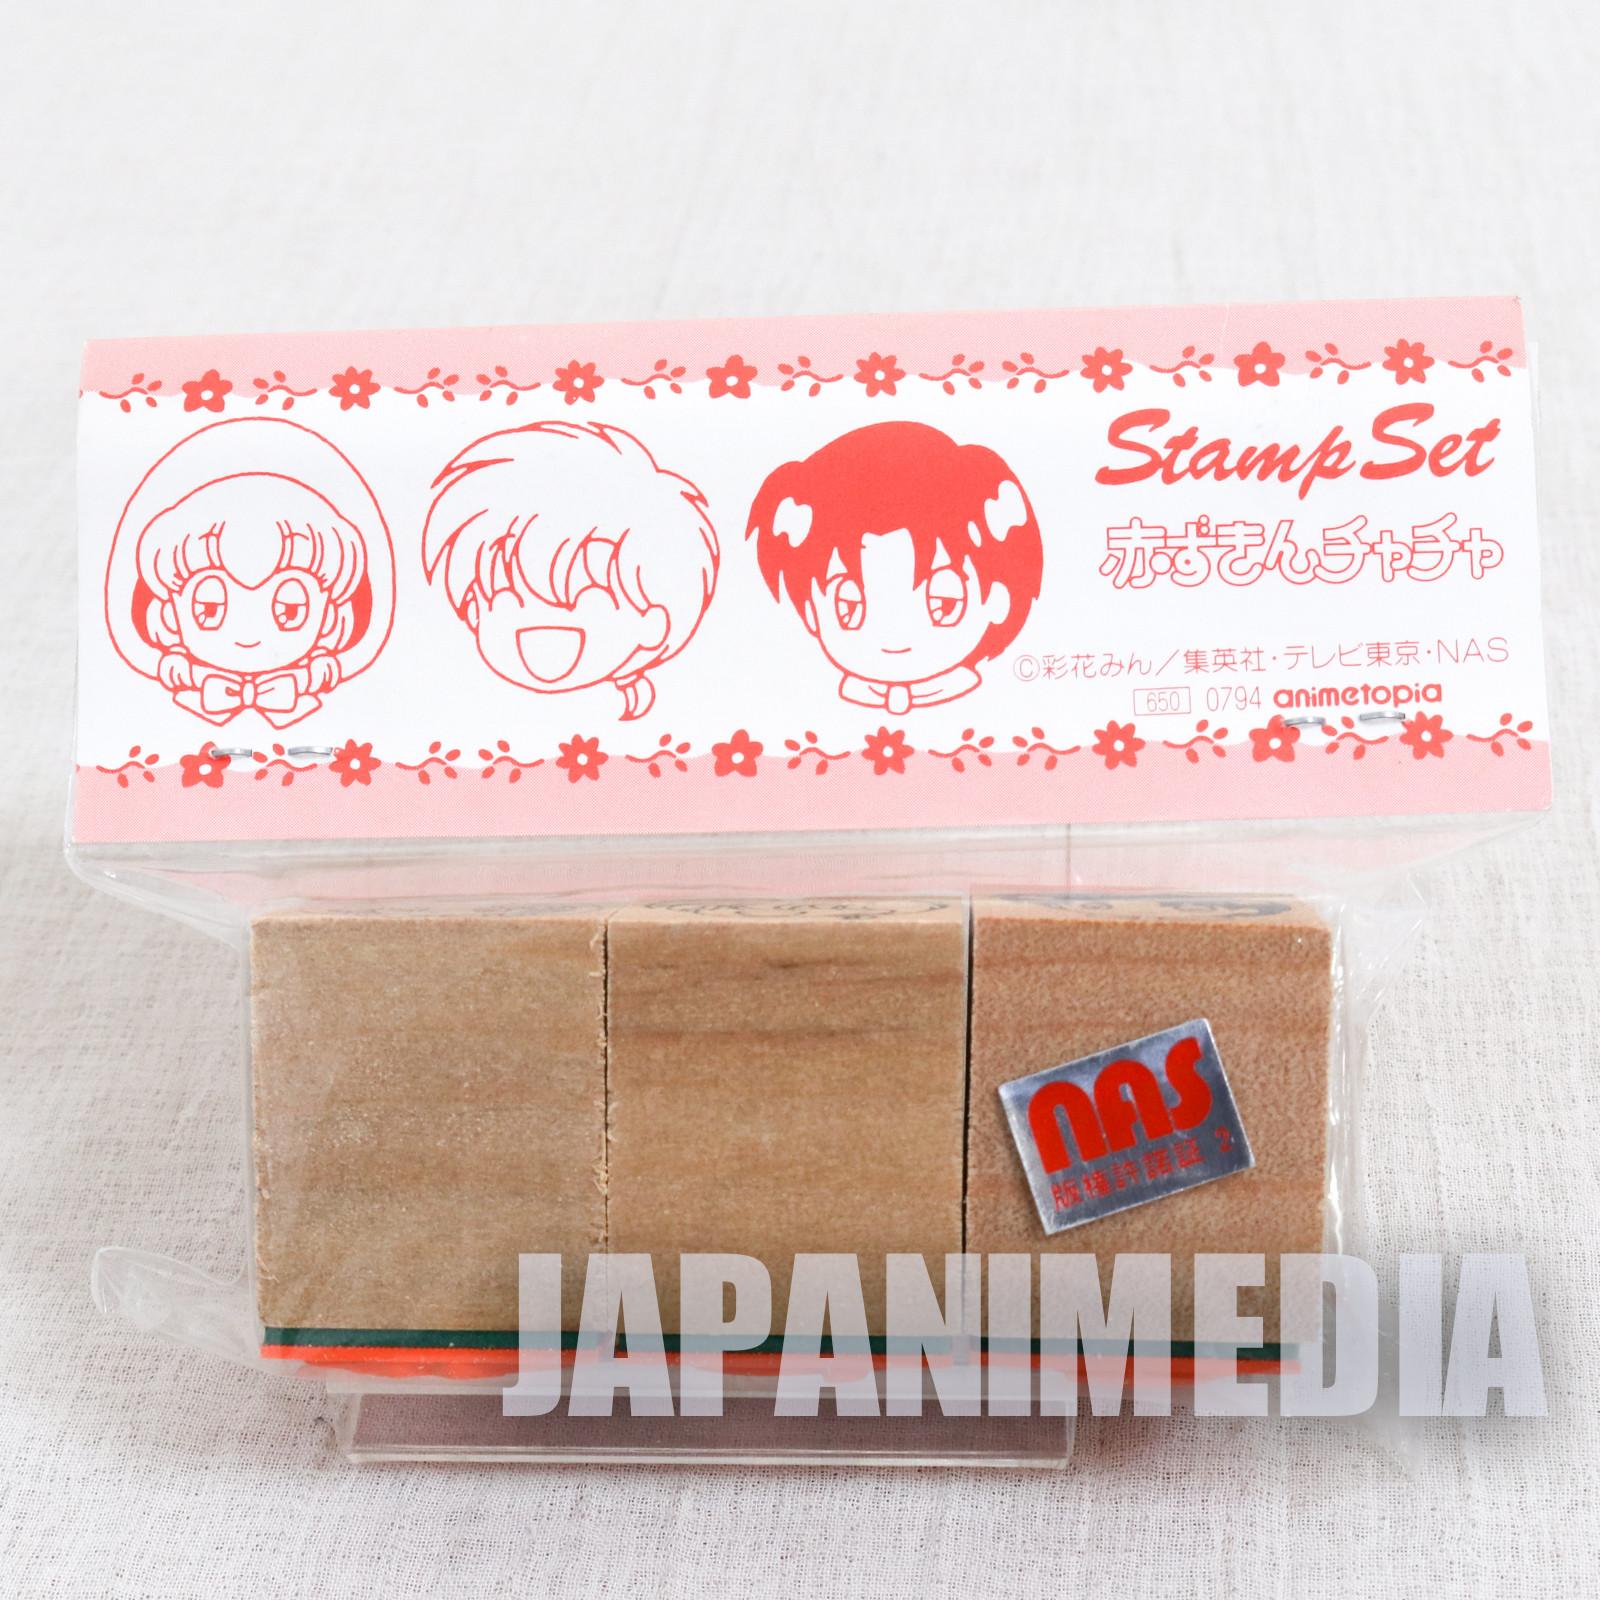 Akazukin Chacha Riiya Shiine Stamp 3pc Set JAPAN ANIME